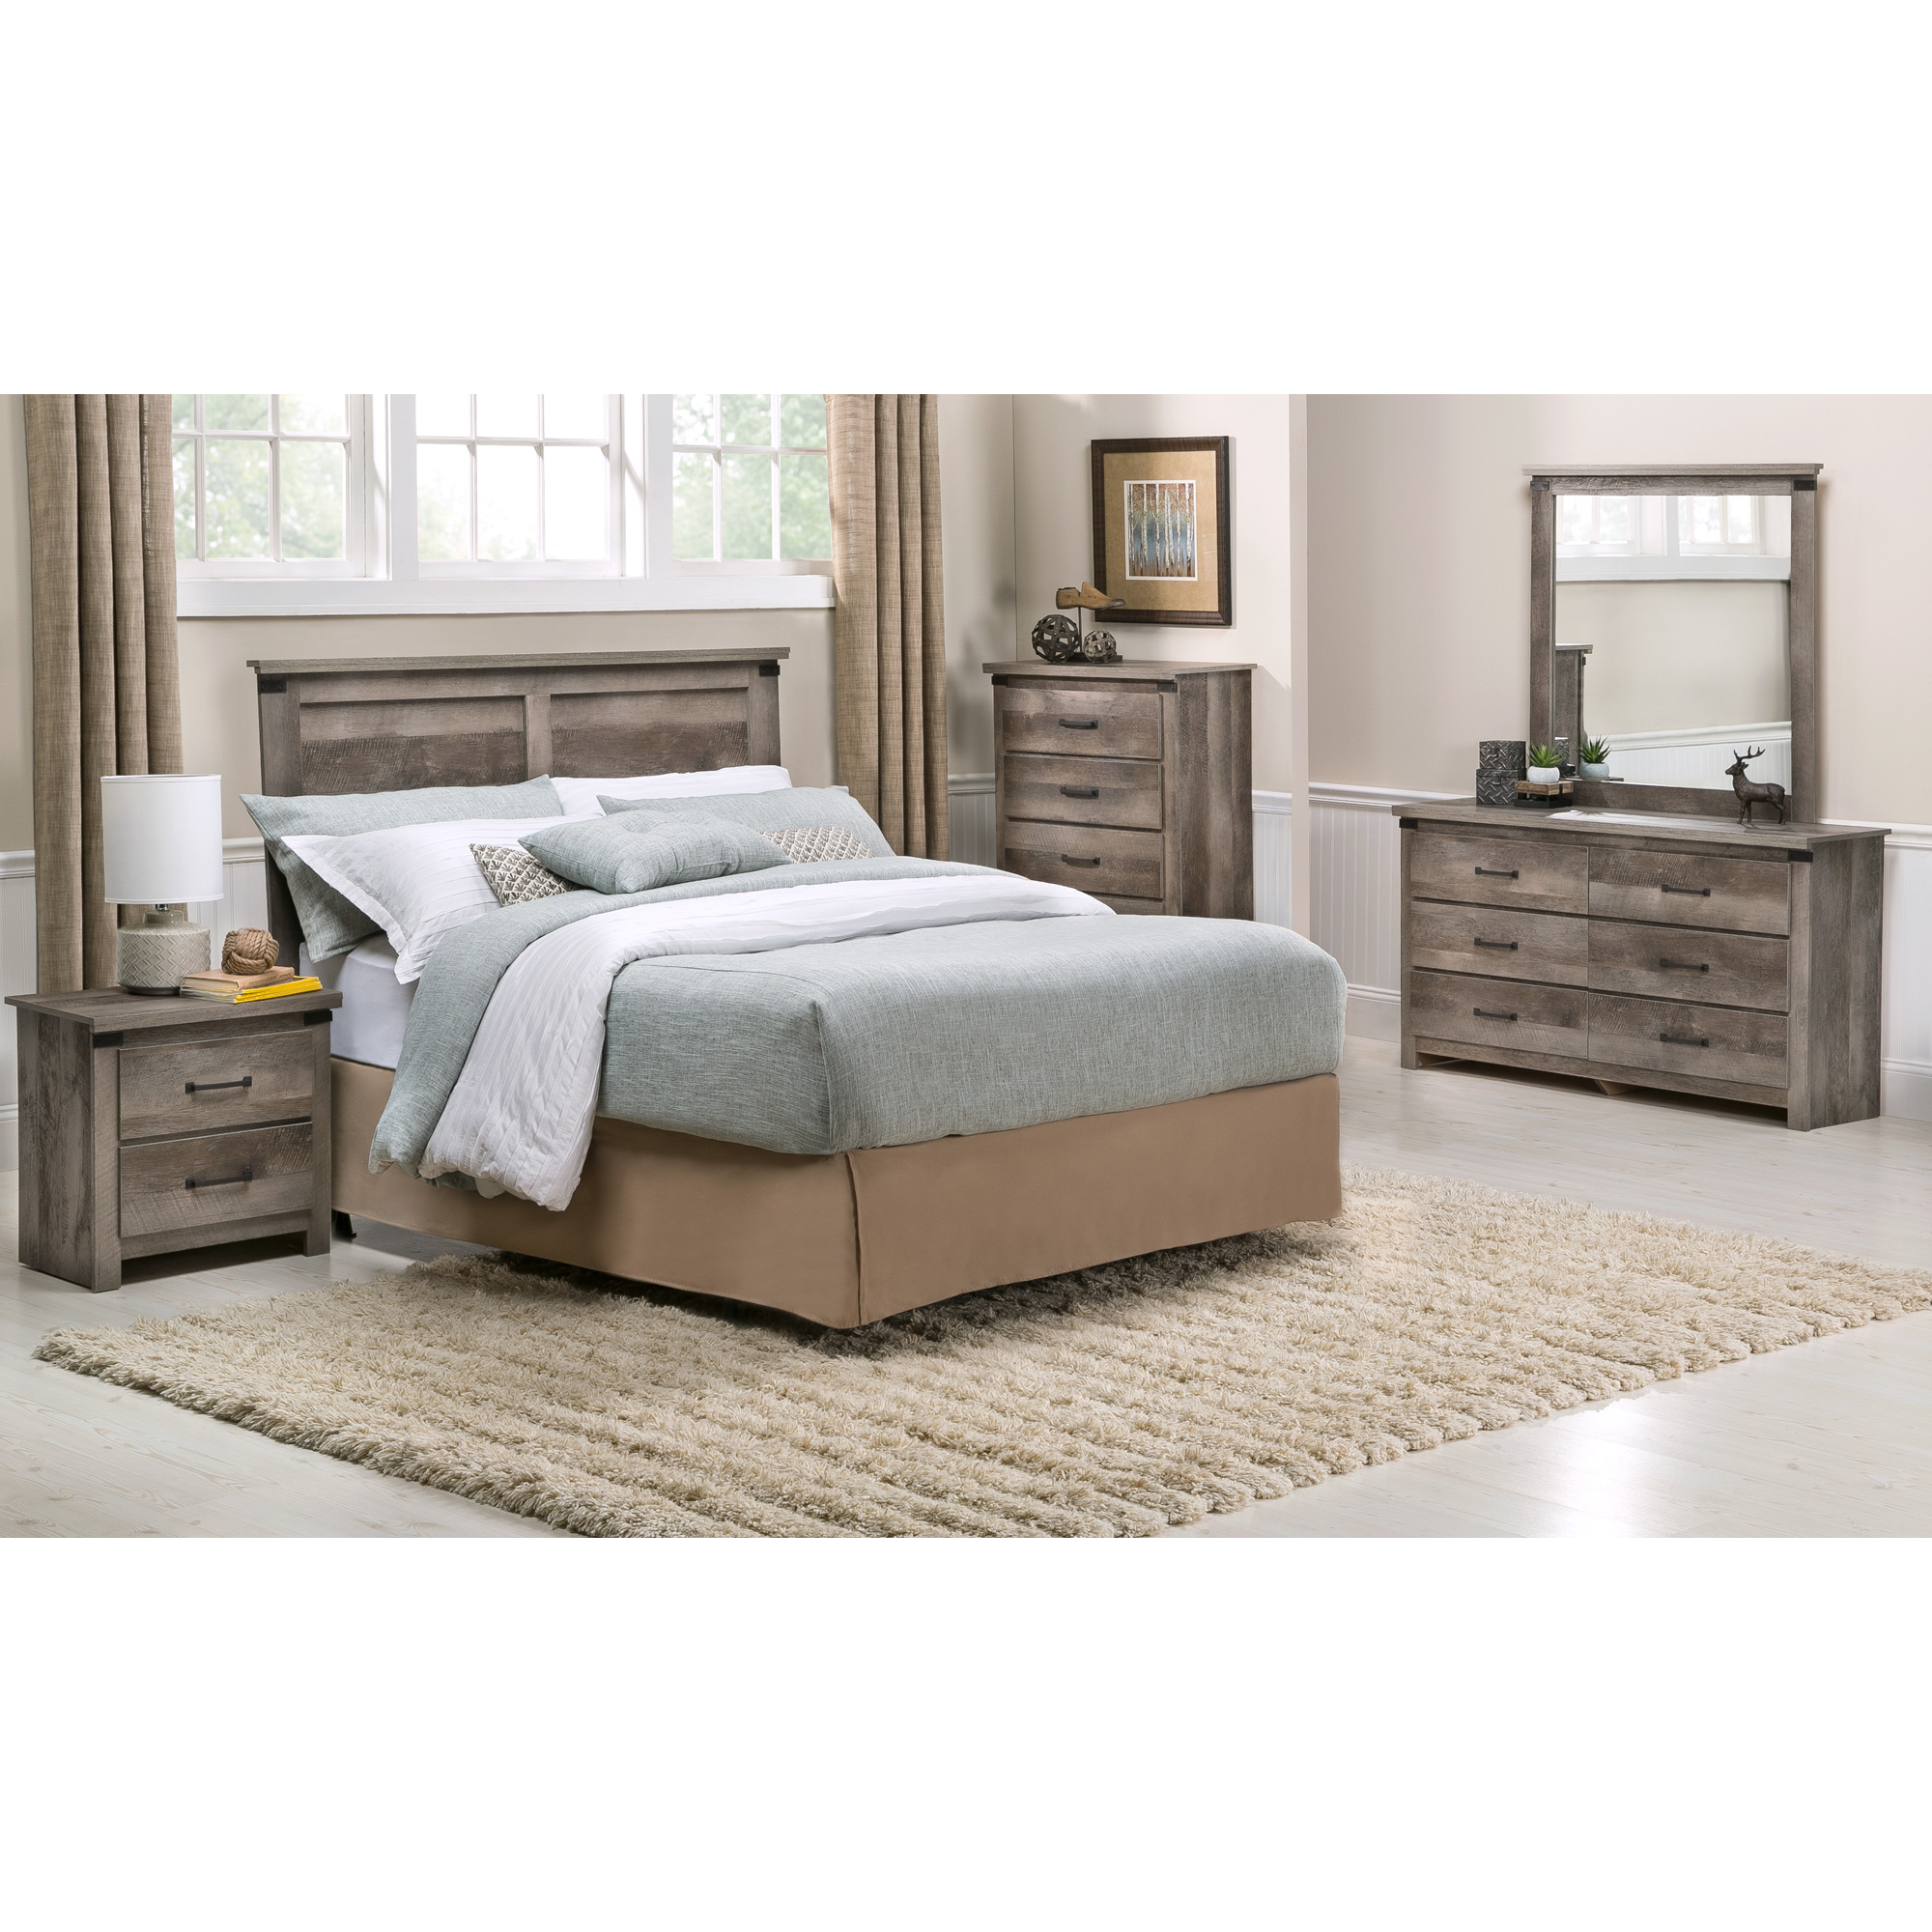 Gambrel Driftwood 10 Piece Full Queen Panel Room Package